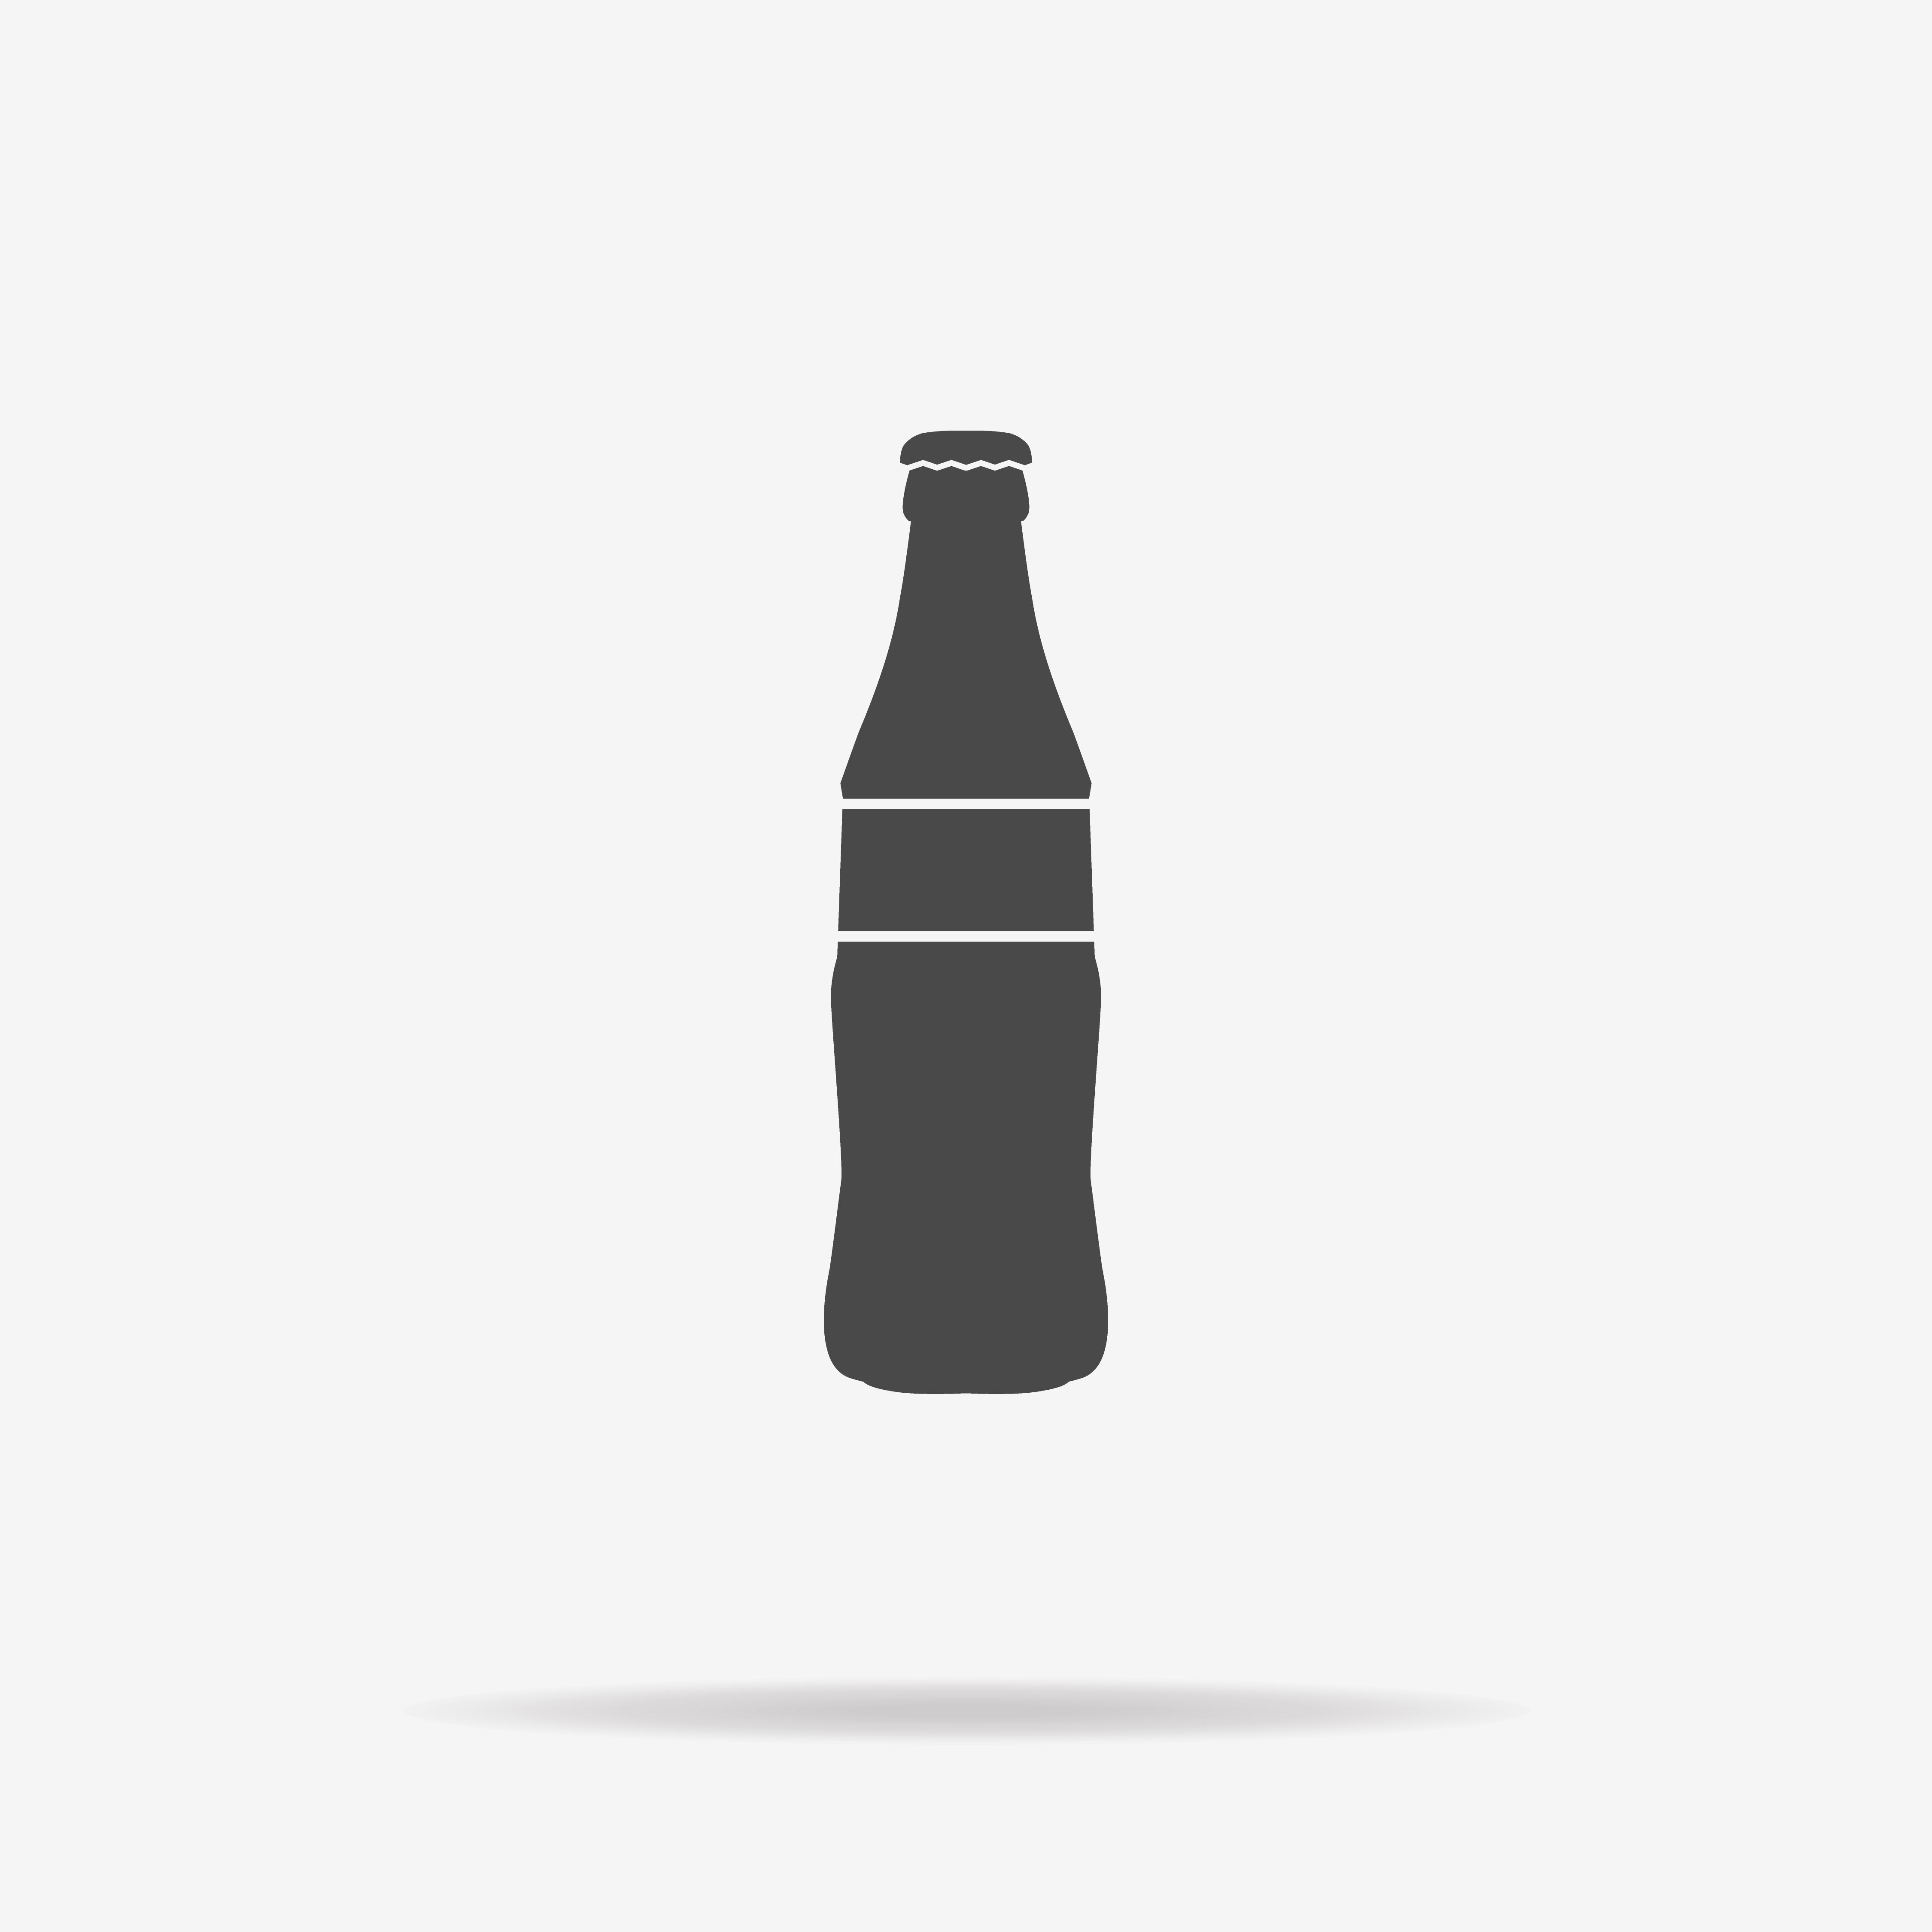 soda bottle icon.jpg